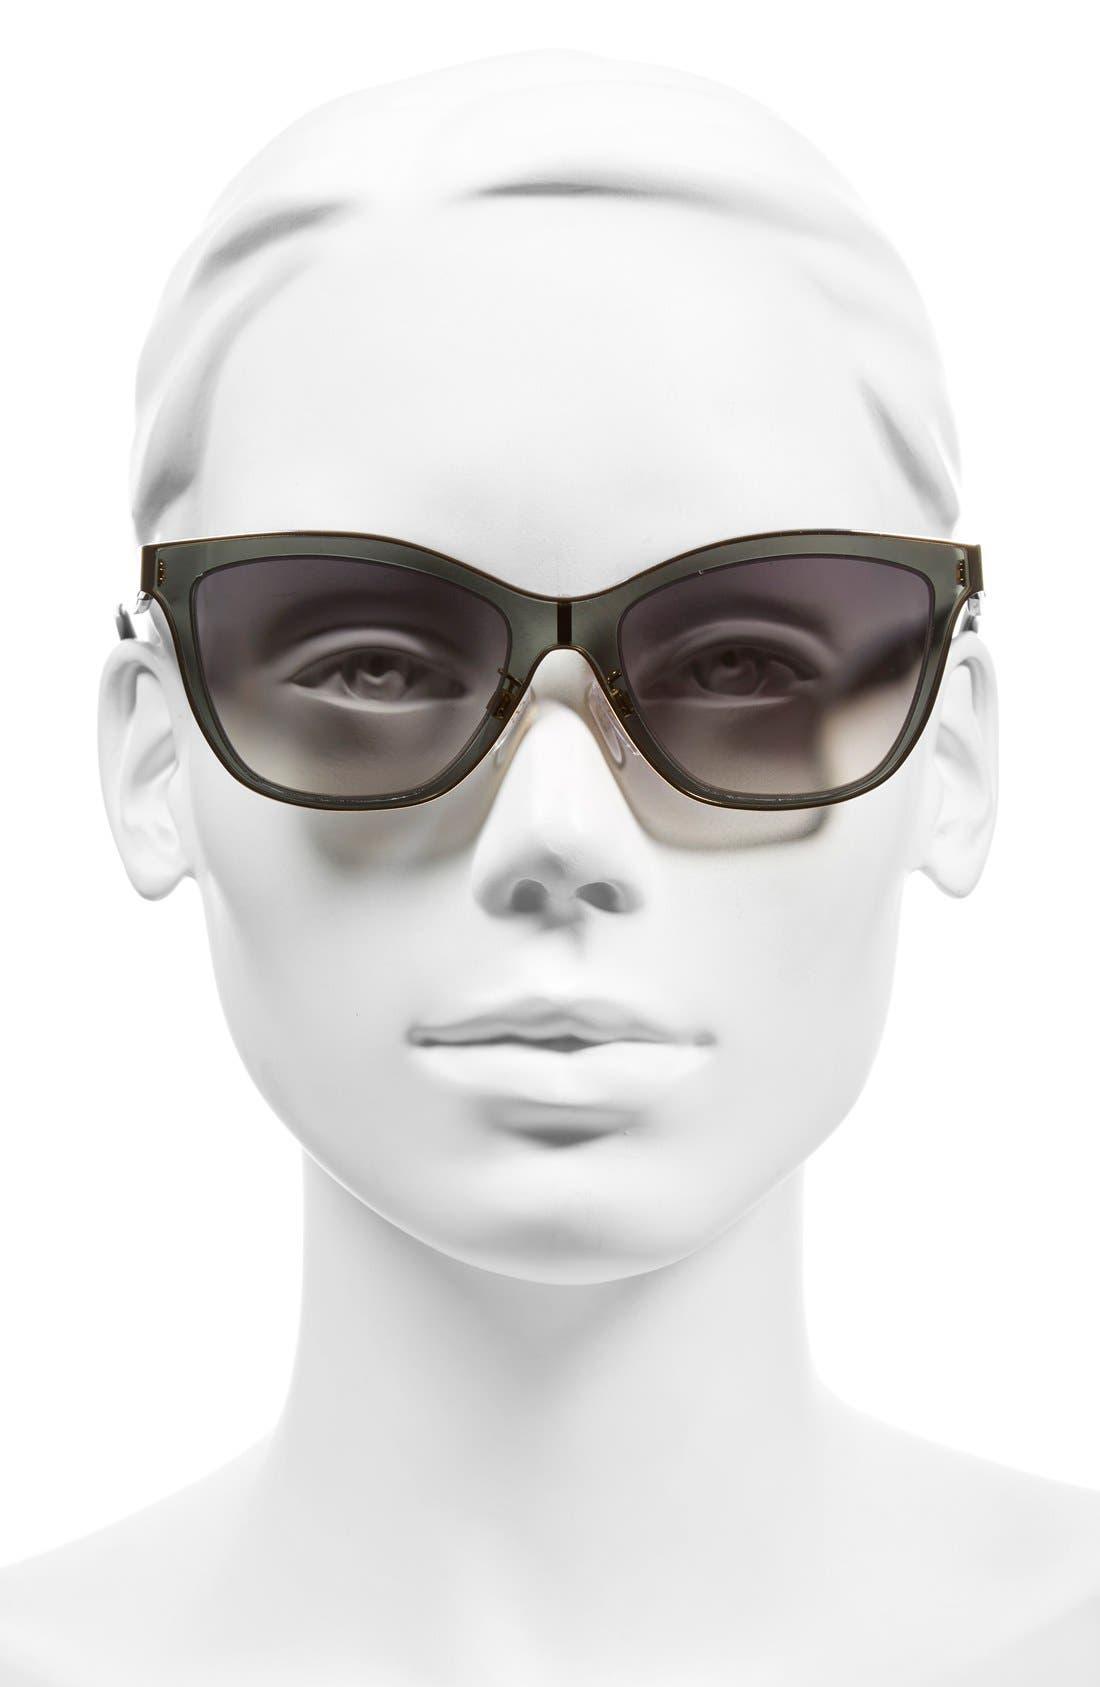 Paris 54mm Sunglasses,                             Alternate thumbnail 2, color,                             Rose Gold/ Black/ Smoke